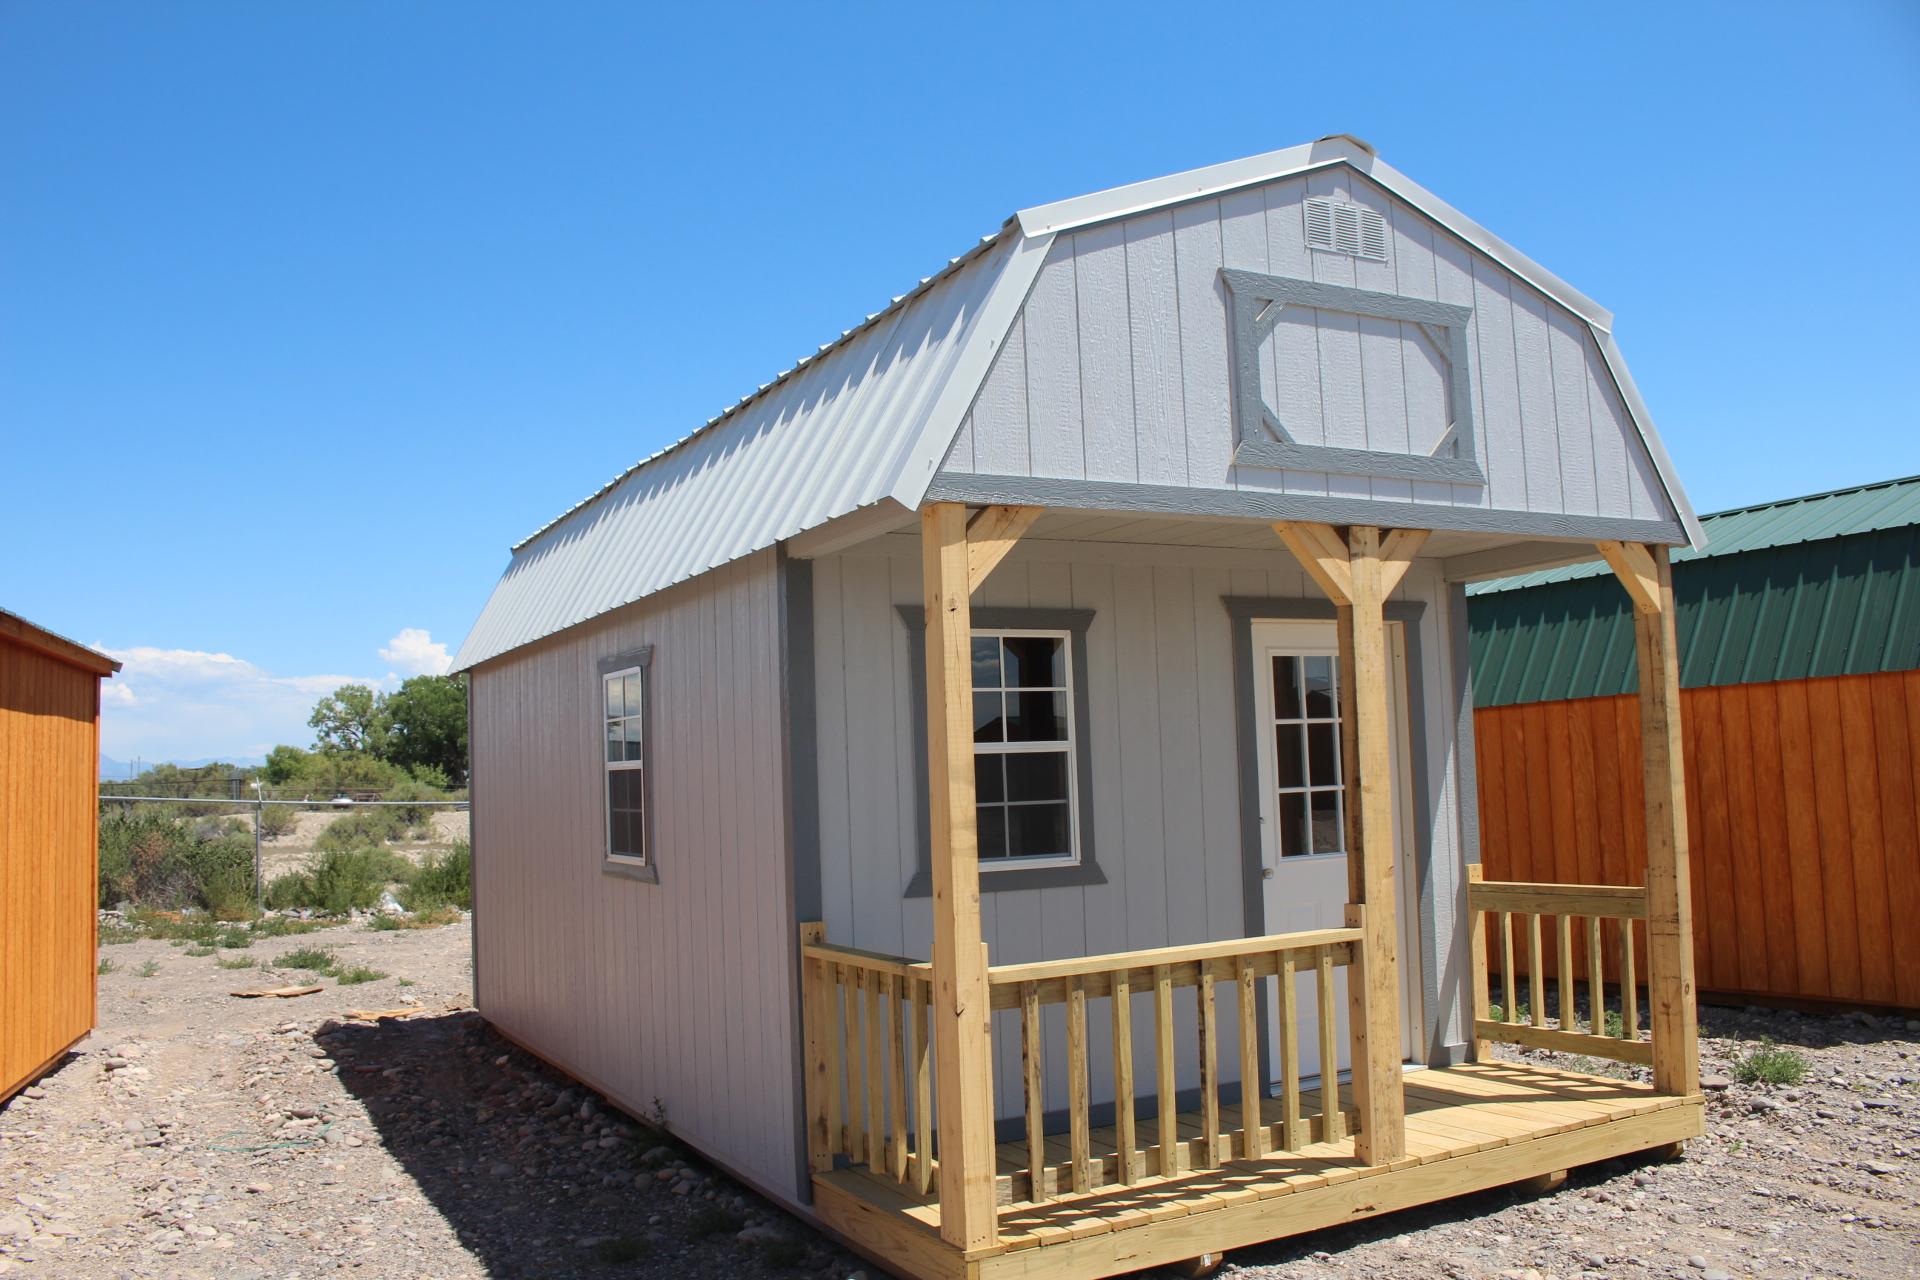 Storage shed with a loft